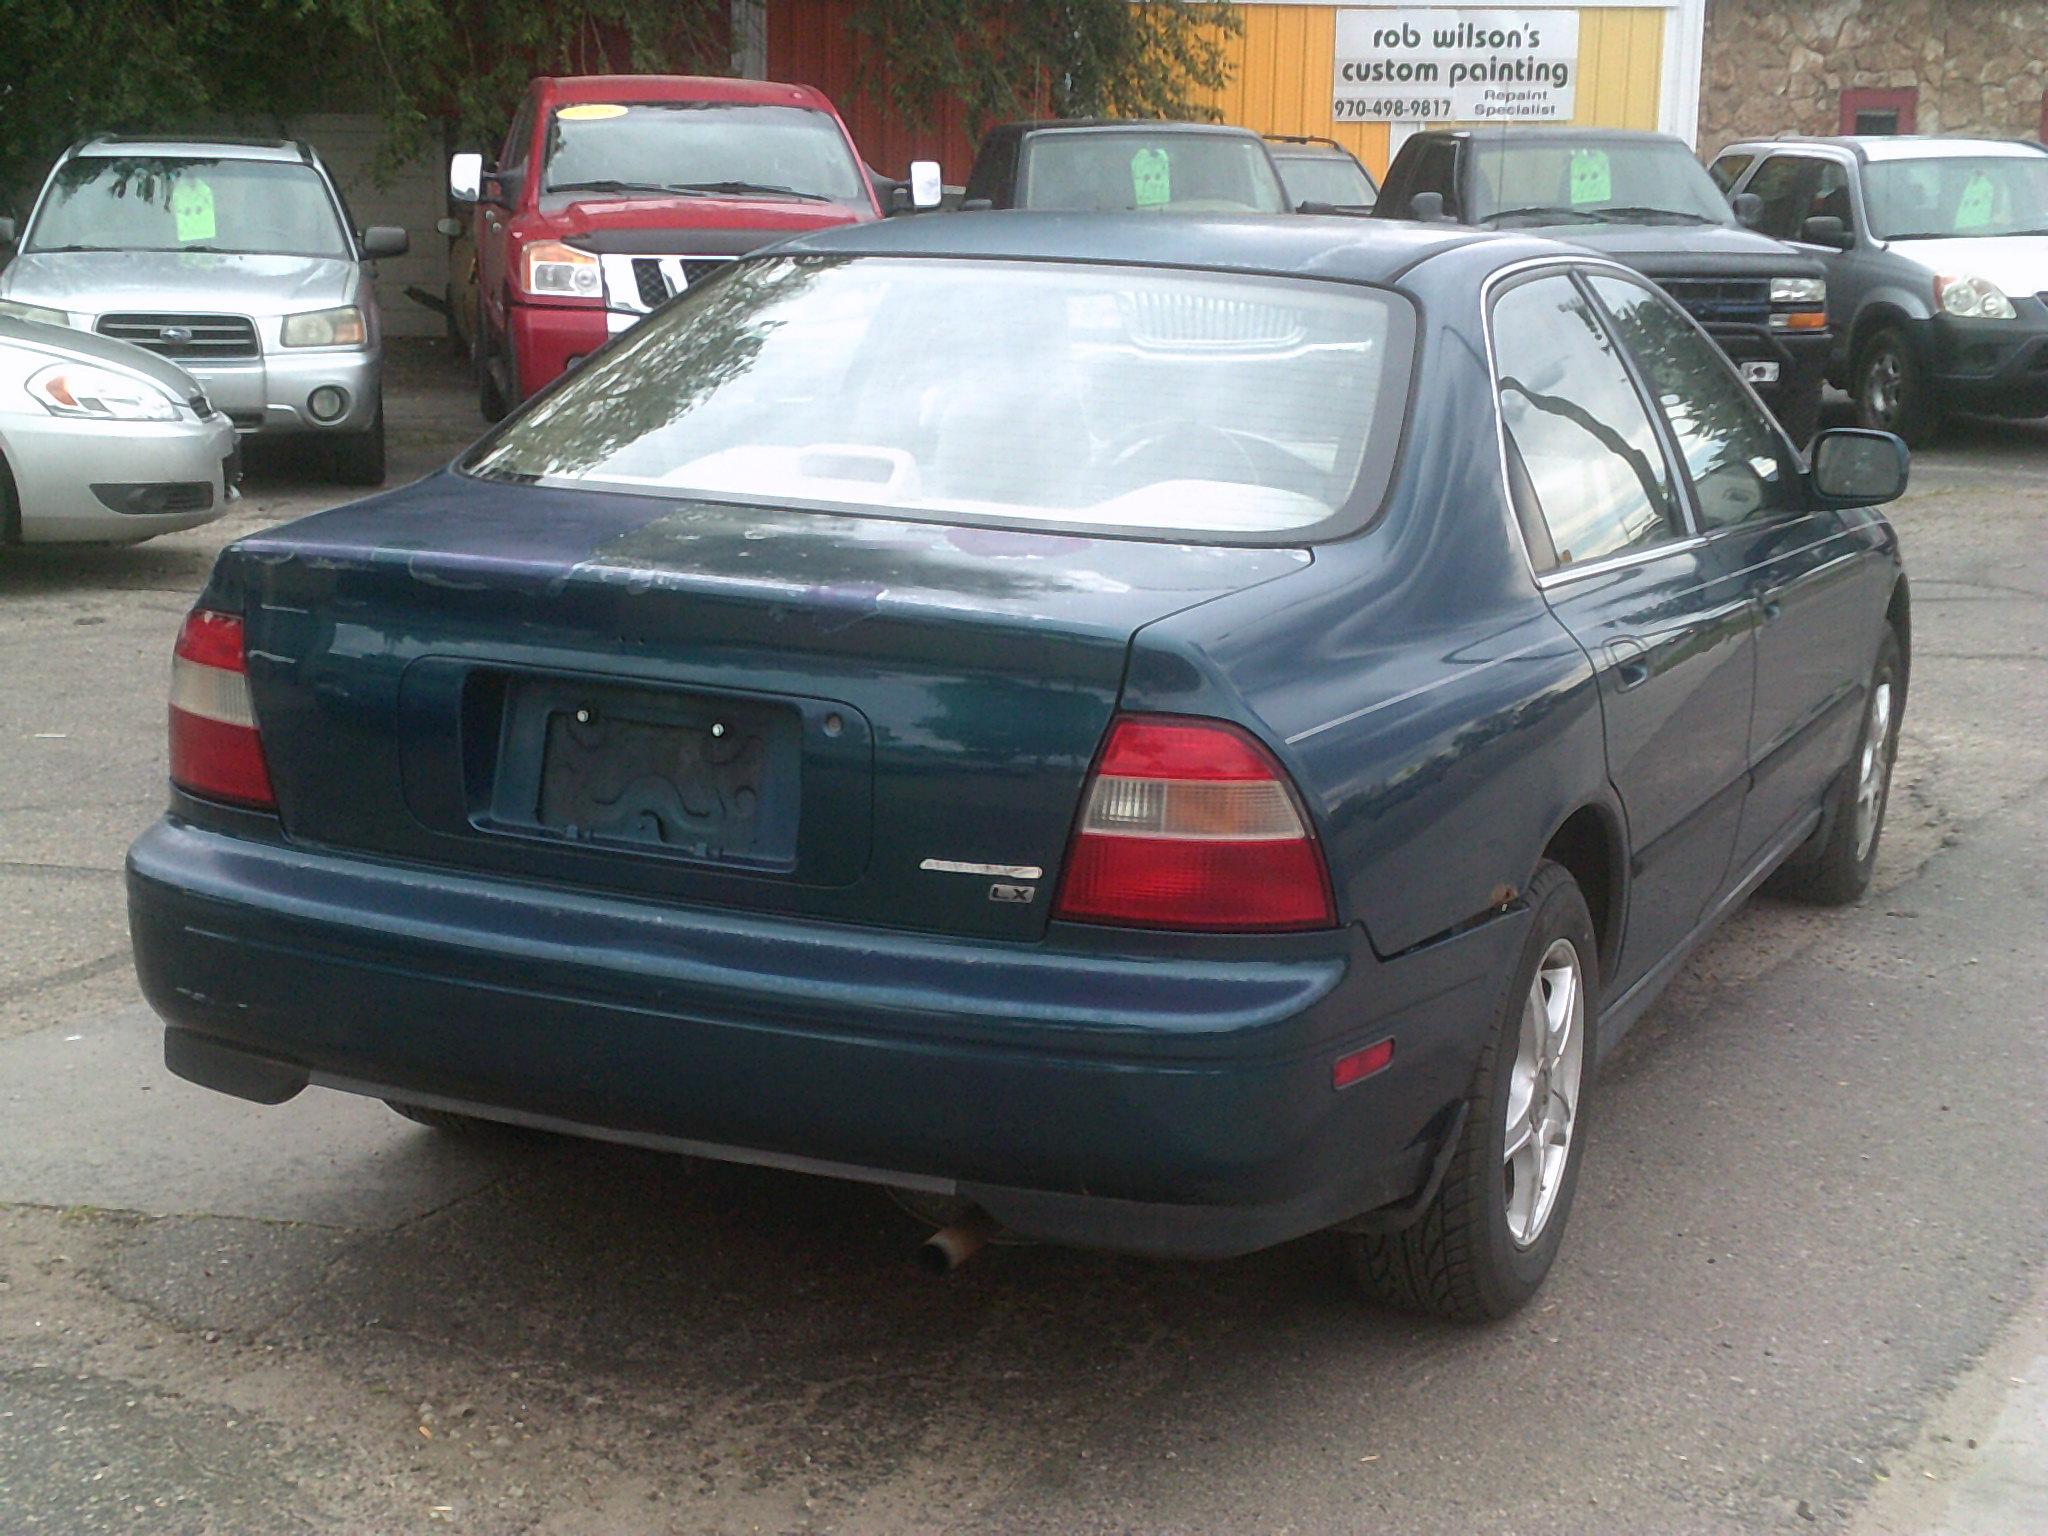 1995 Honda Accord LX $1950 | Mr. AUTO